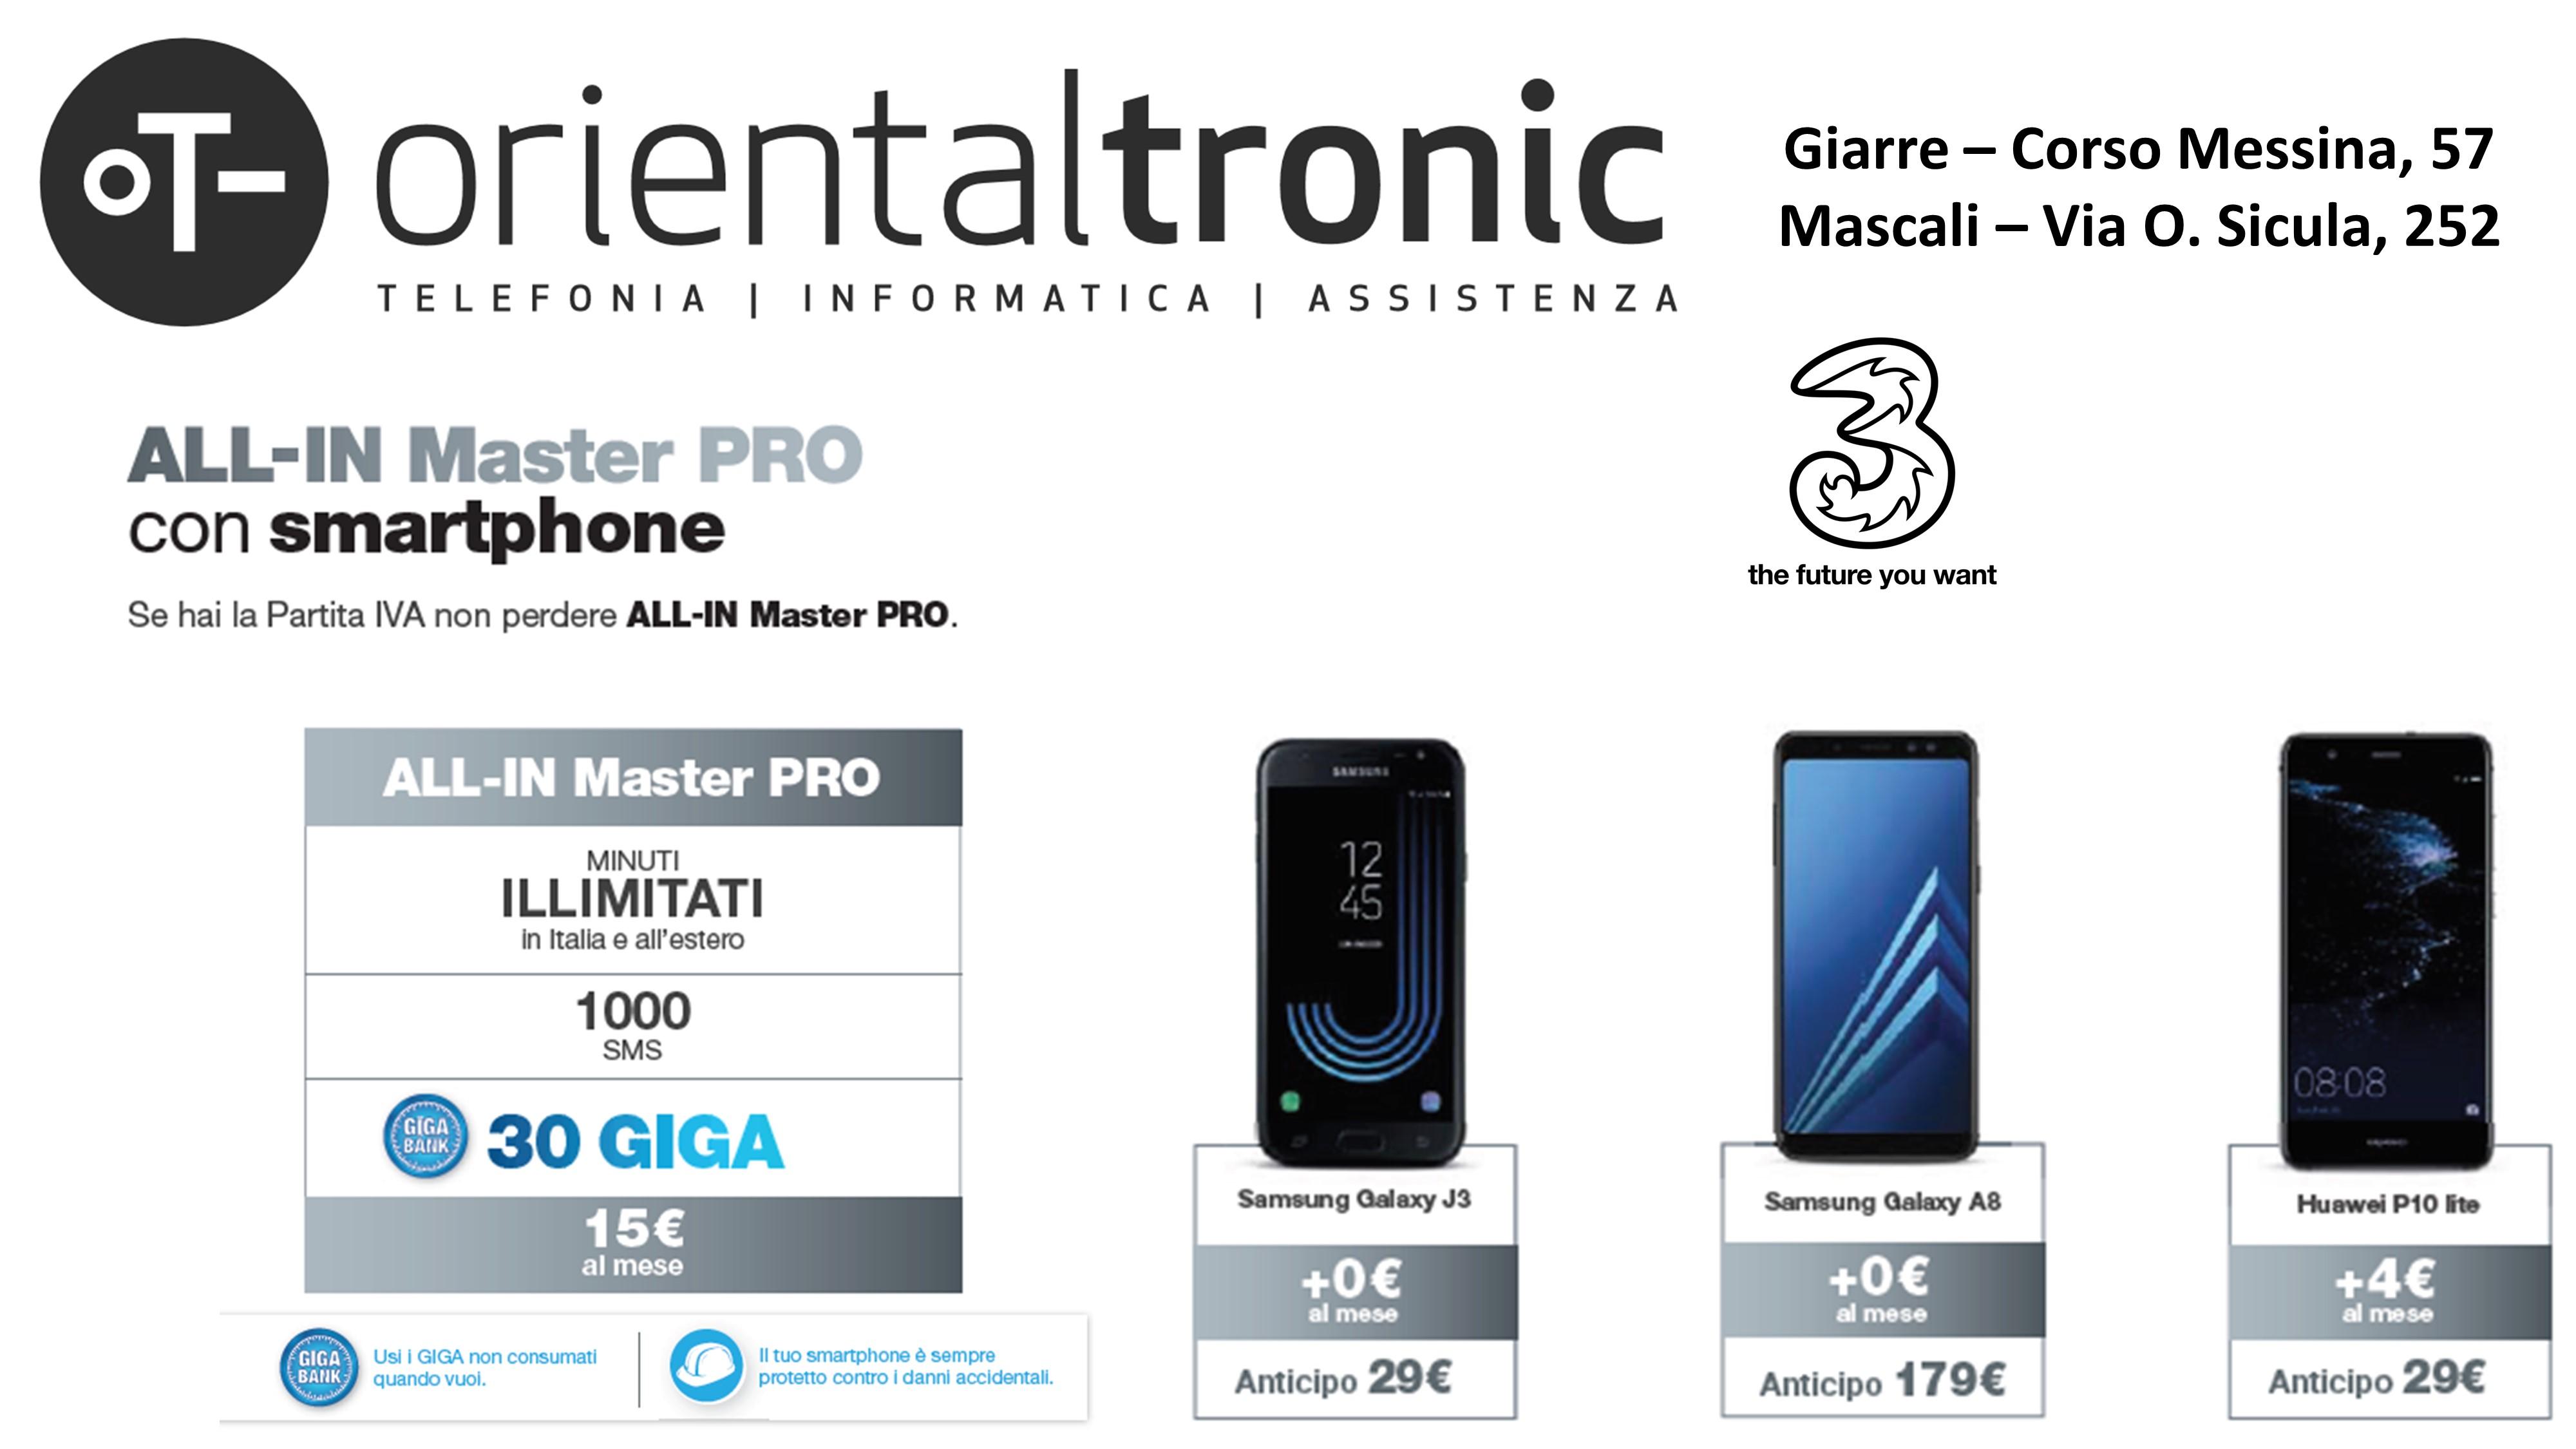 ALL-IN Master PRO smartphone 3 P.Iva